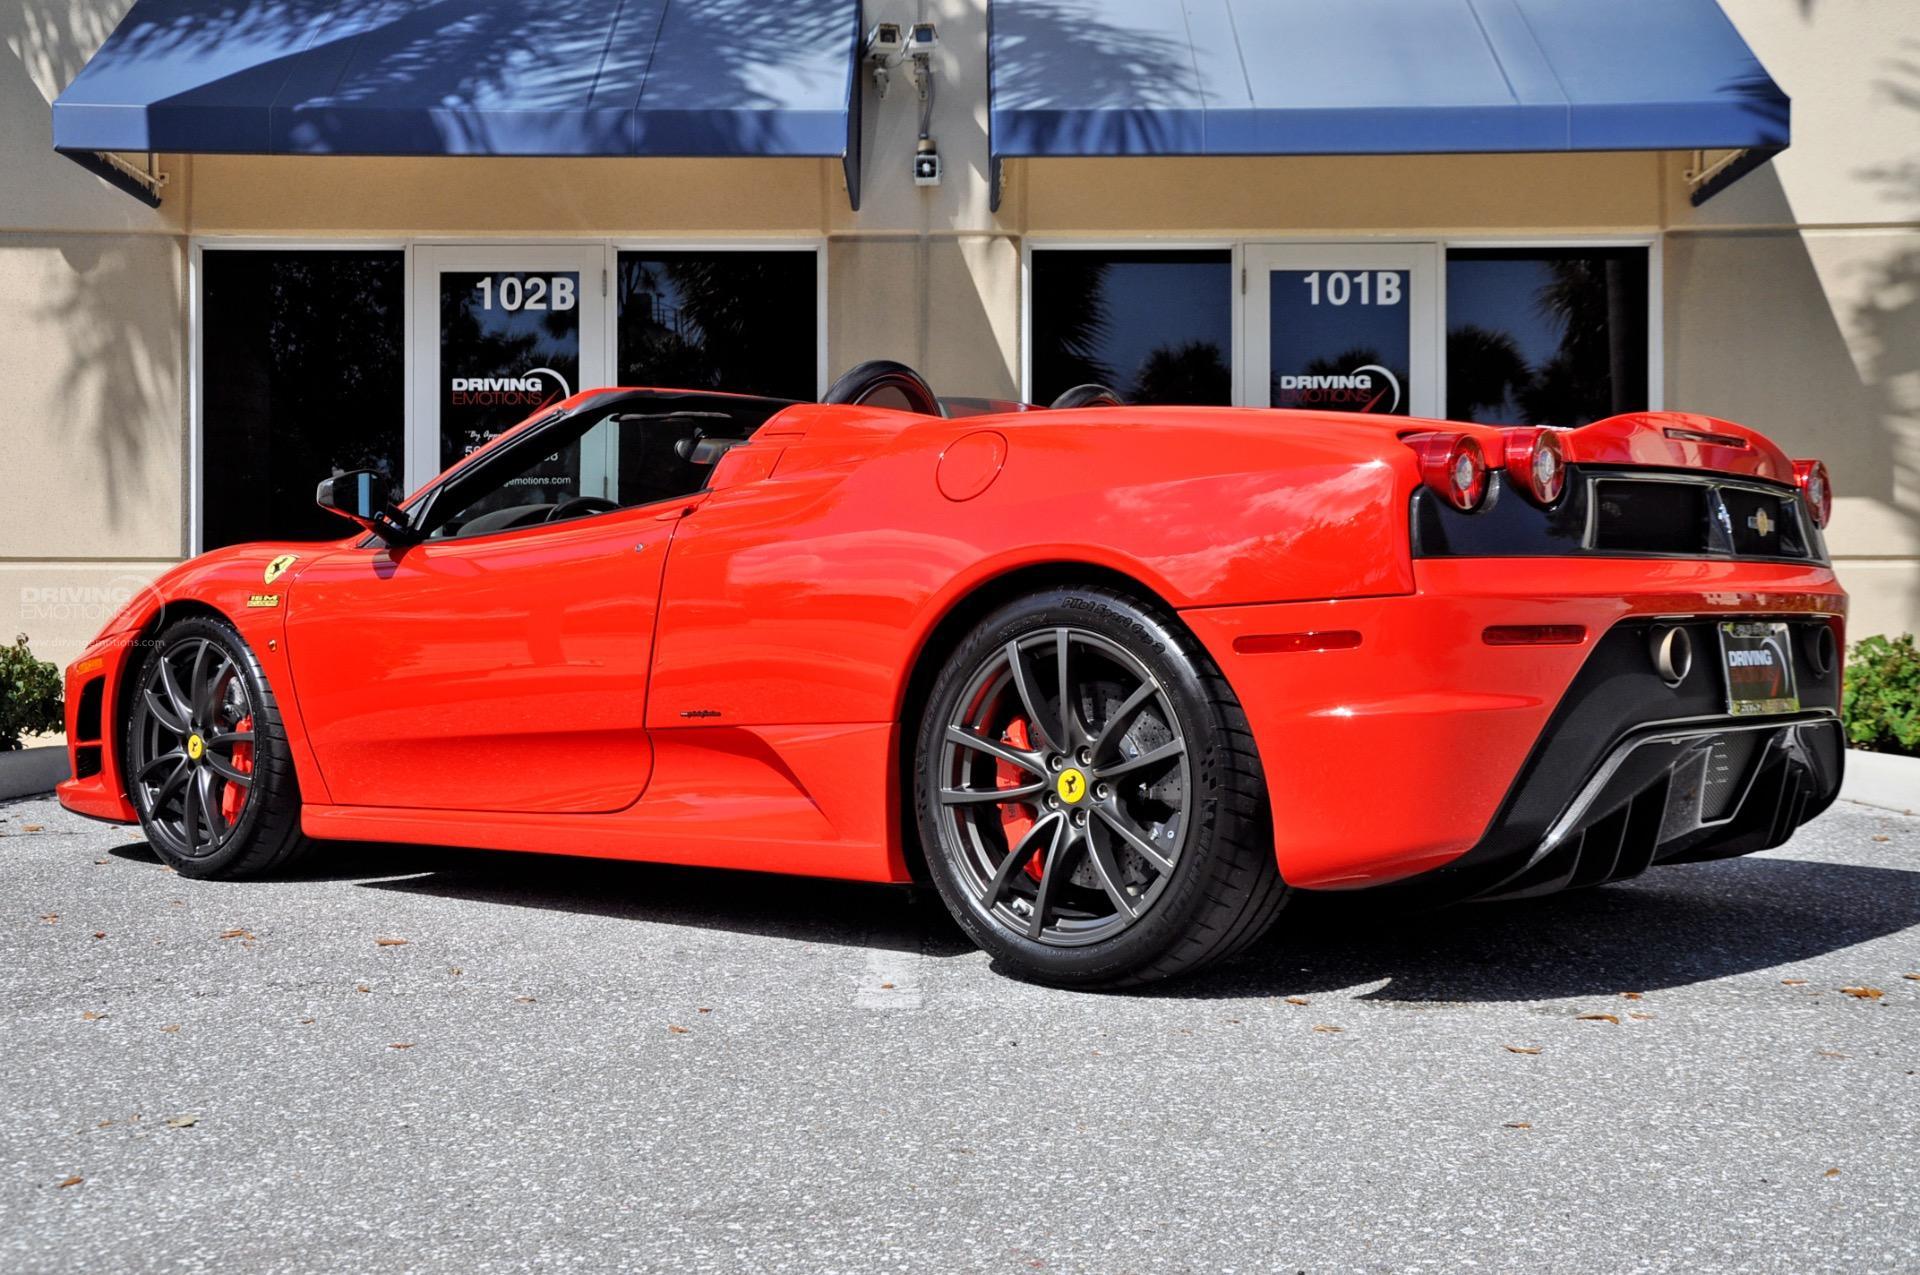 Used Ferraris For Sale >> 2009 Ferrari F430 Scuderia Spider 16M Scuderia Spider 16M Stock # 5825 for sale near Lake Park ...